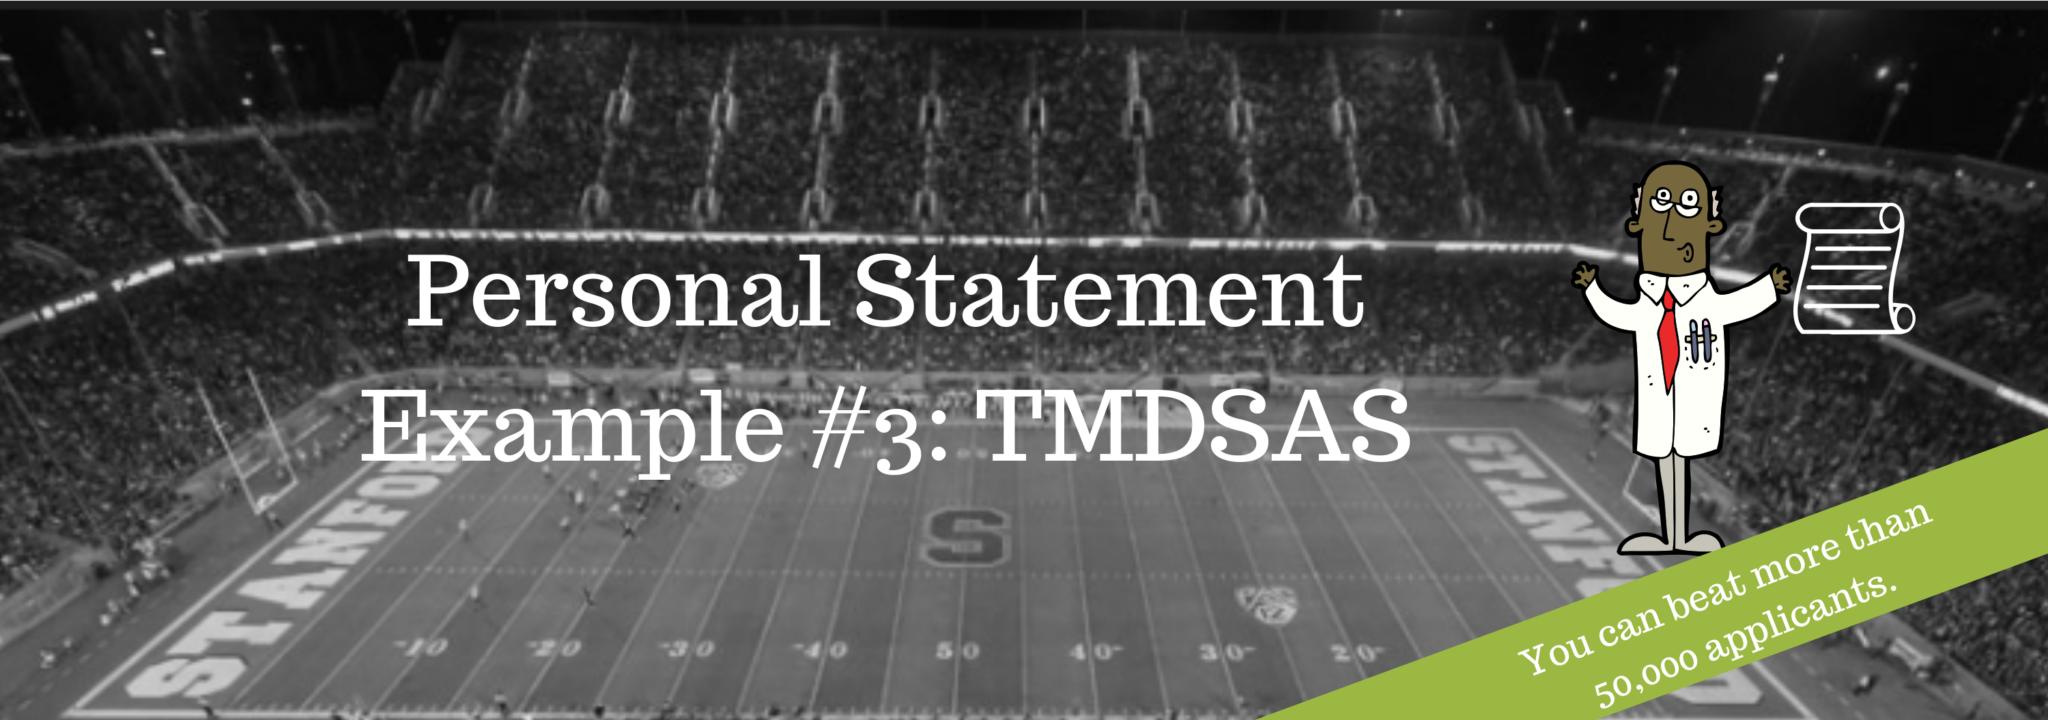 Personal Statement Example #3 TMDSAS